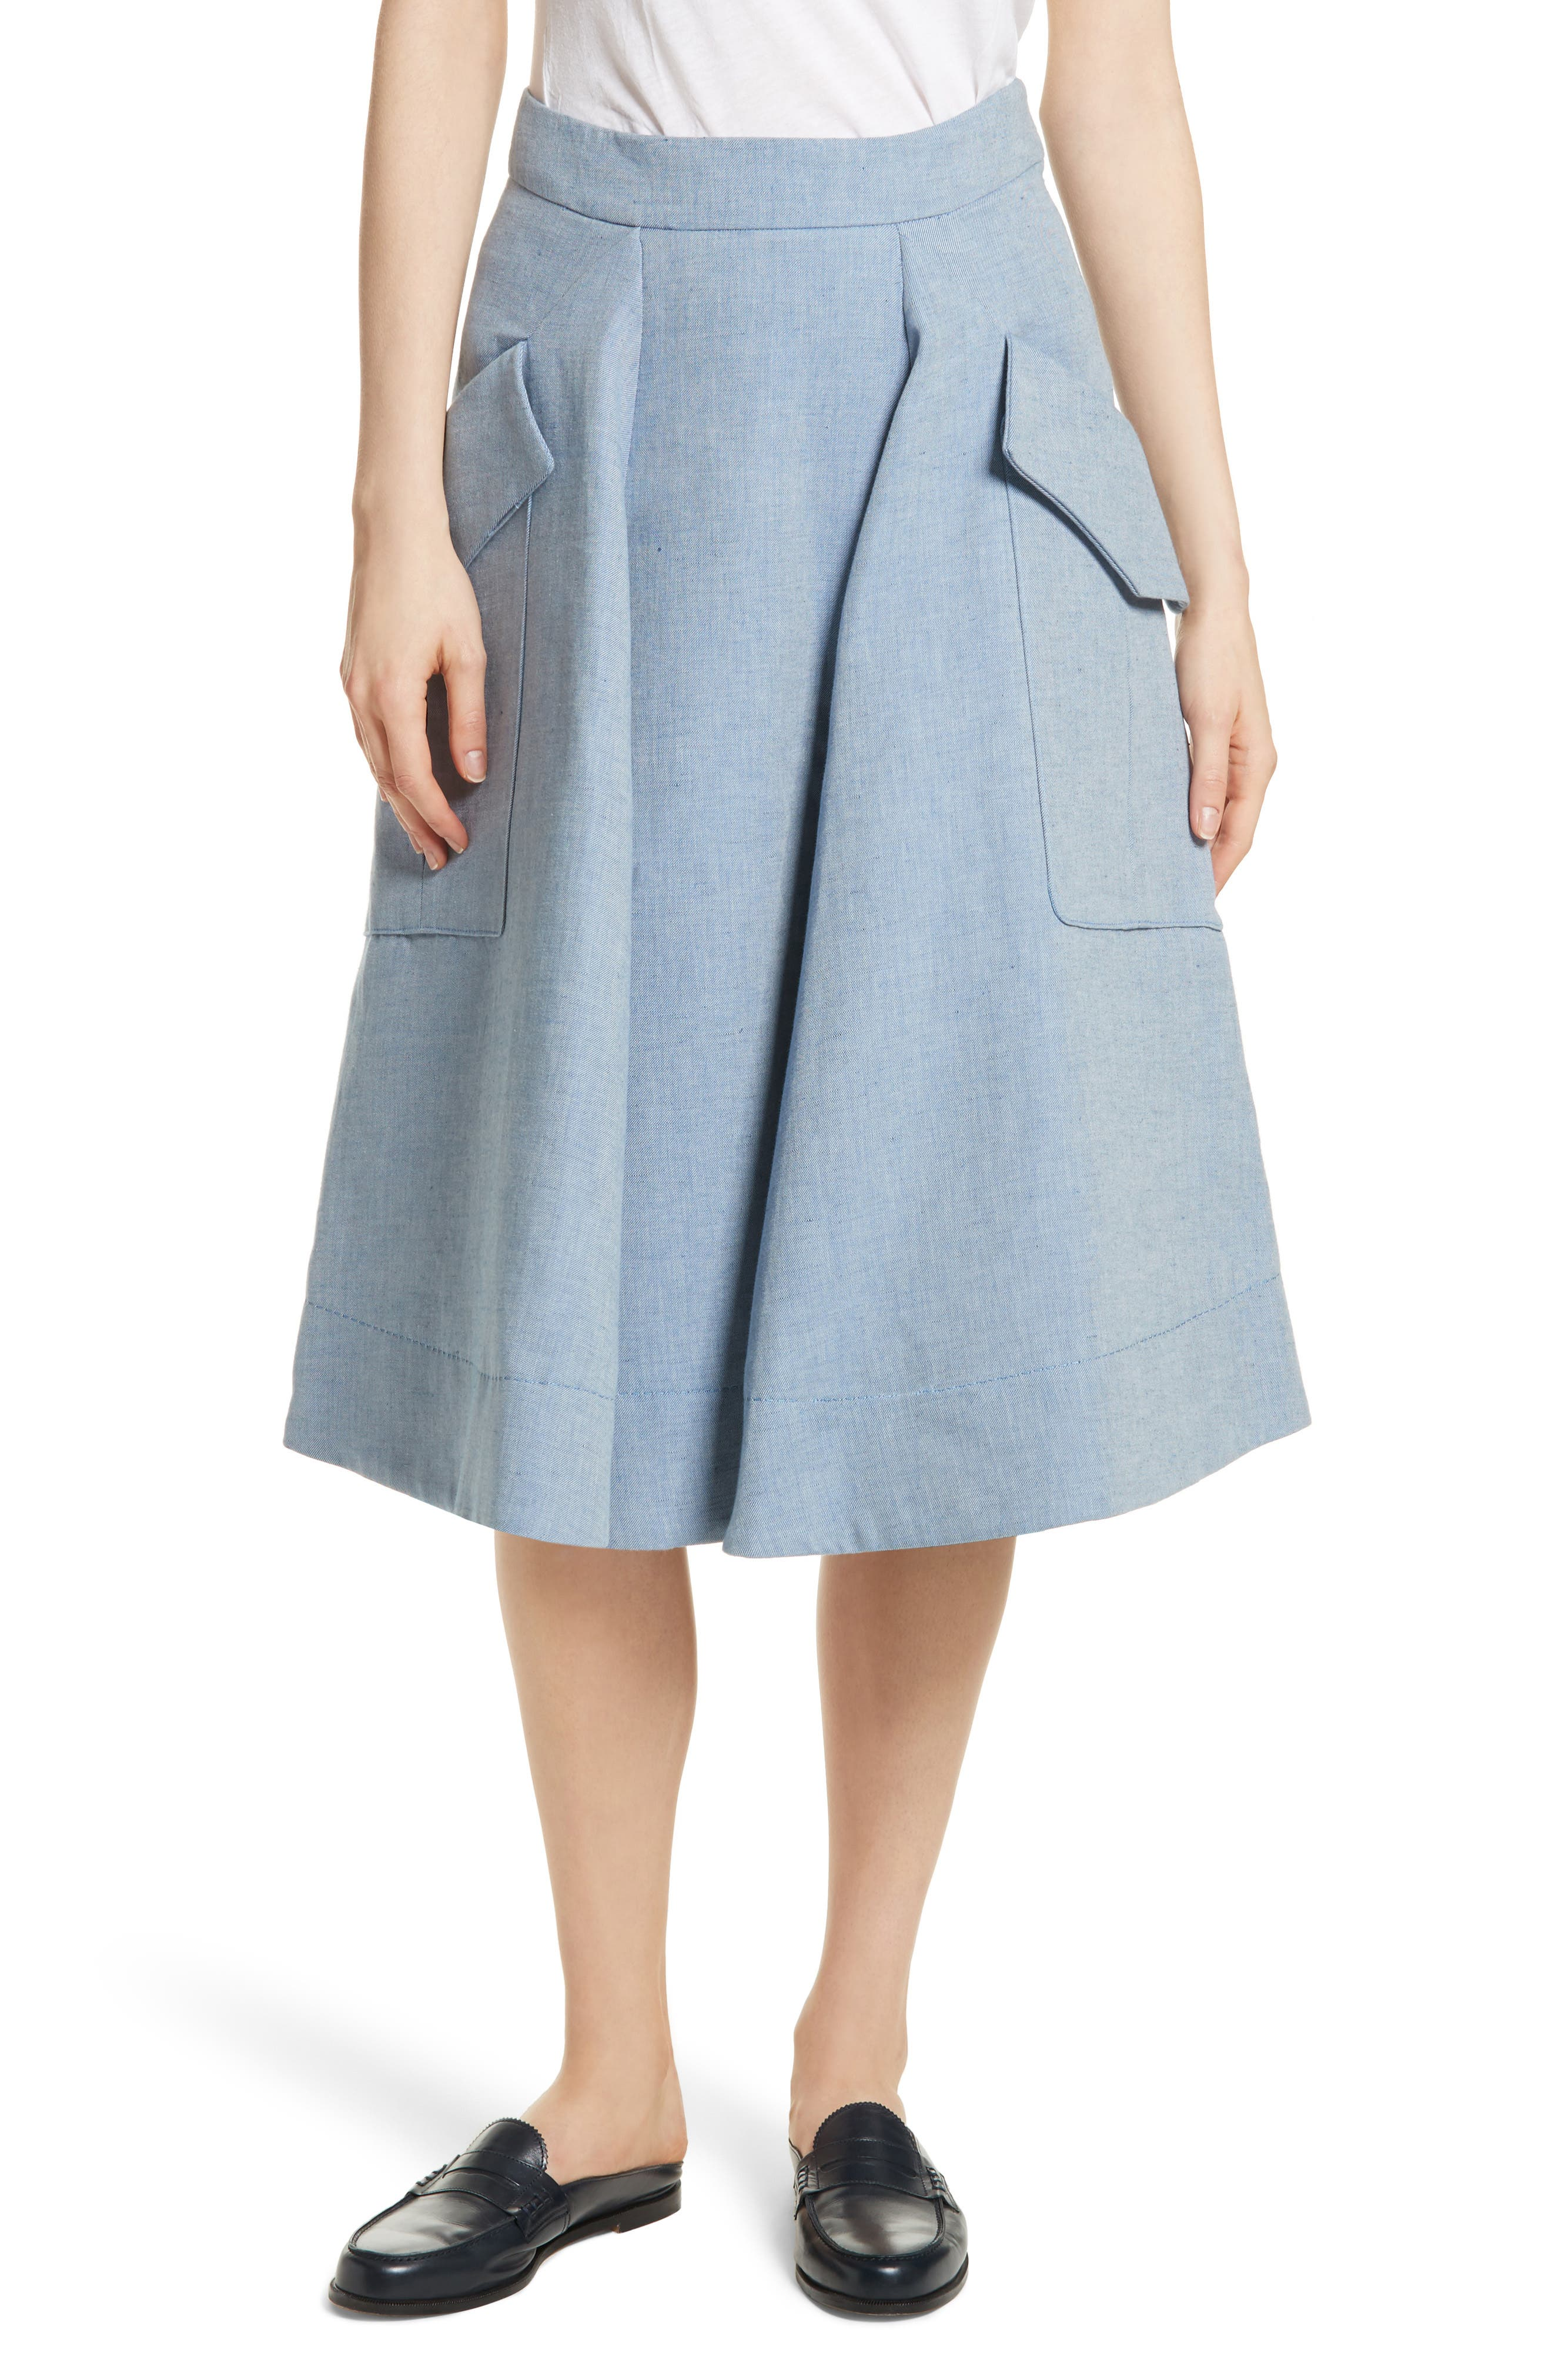 Jupe Genou Skirt,                             Main thumbnail 1, color,                             Bleu Acier